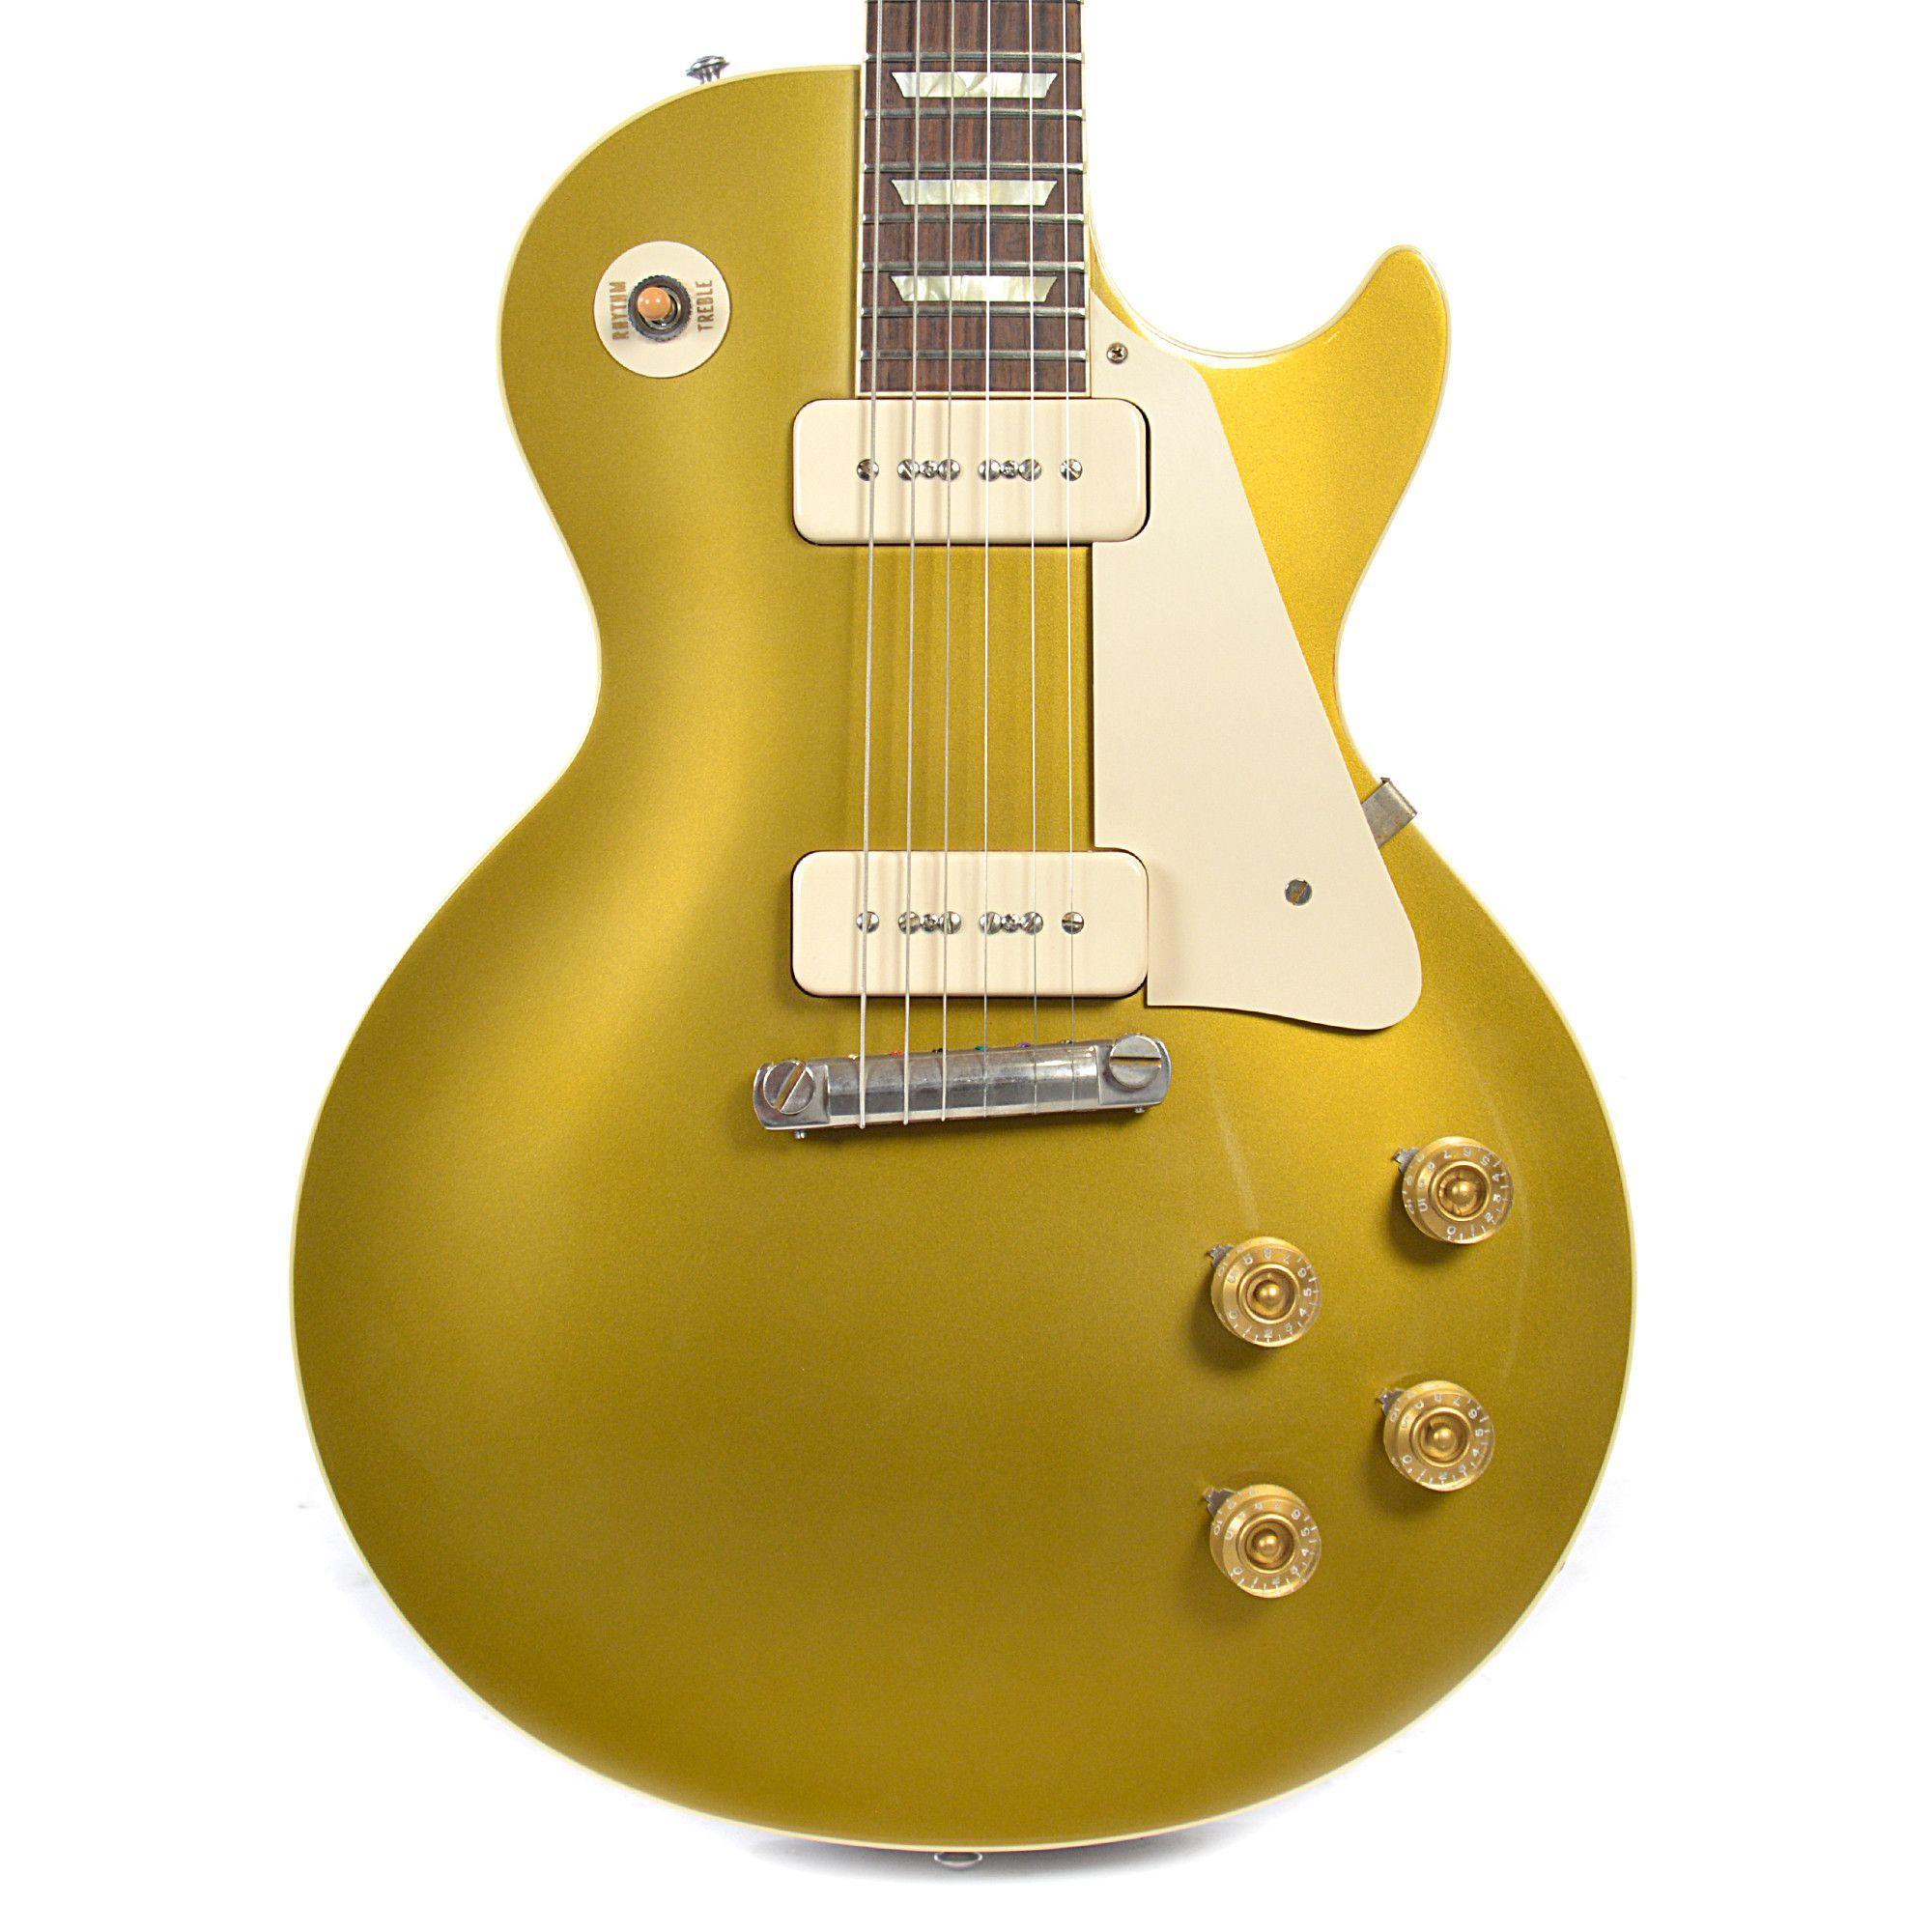 Gibson Custom Shop Les Paul 1954 Reissue Goldtop VOS Serial